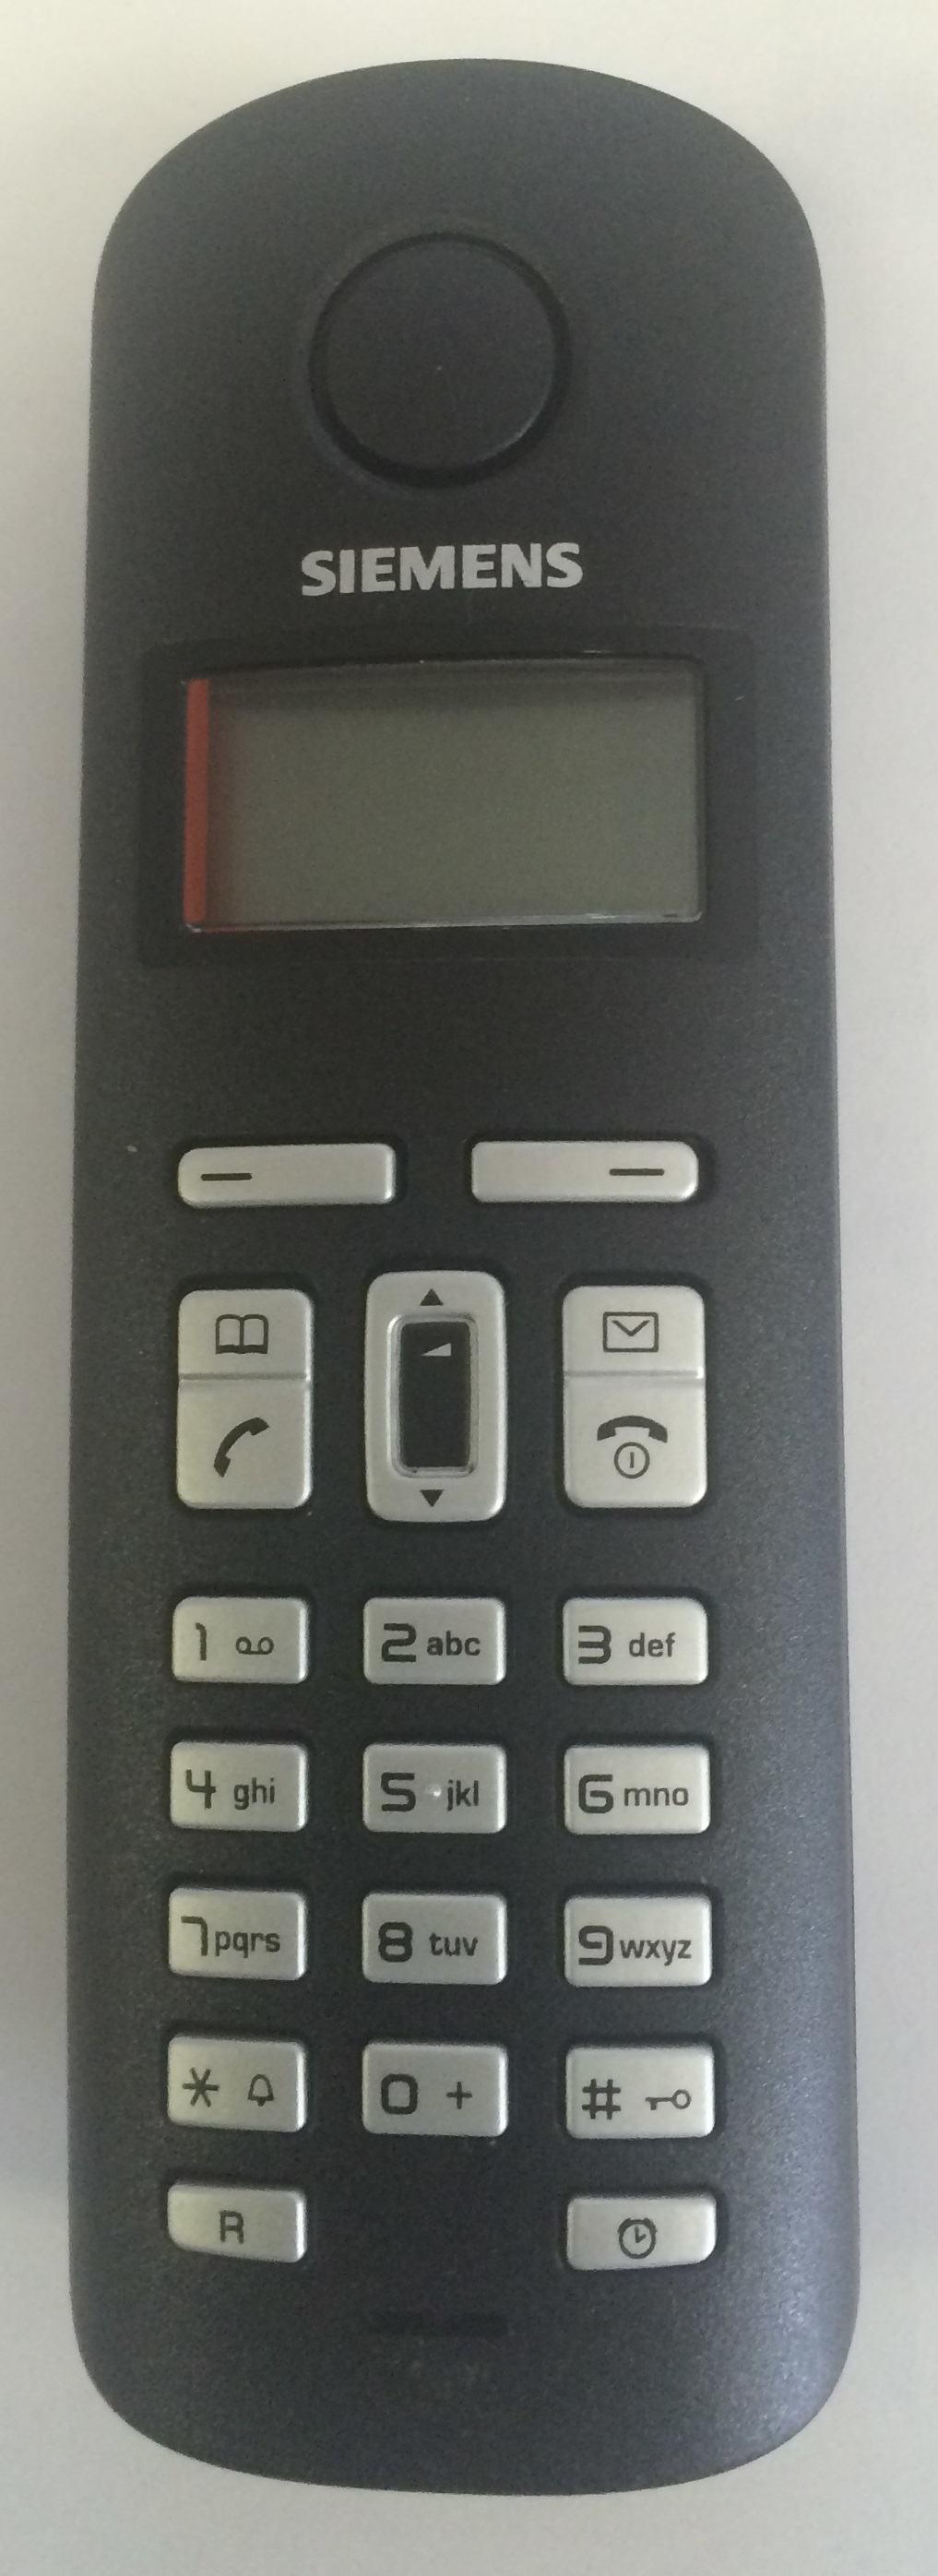 gigaset al140 repairs handsets bases power supplies rh zytel co za siemens gigaset al140 manual pdf siemens gigaset al145 manual